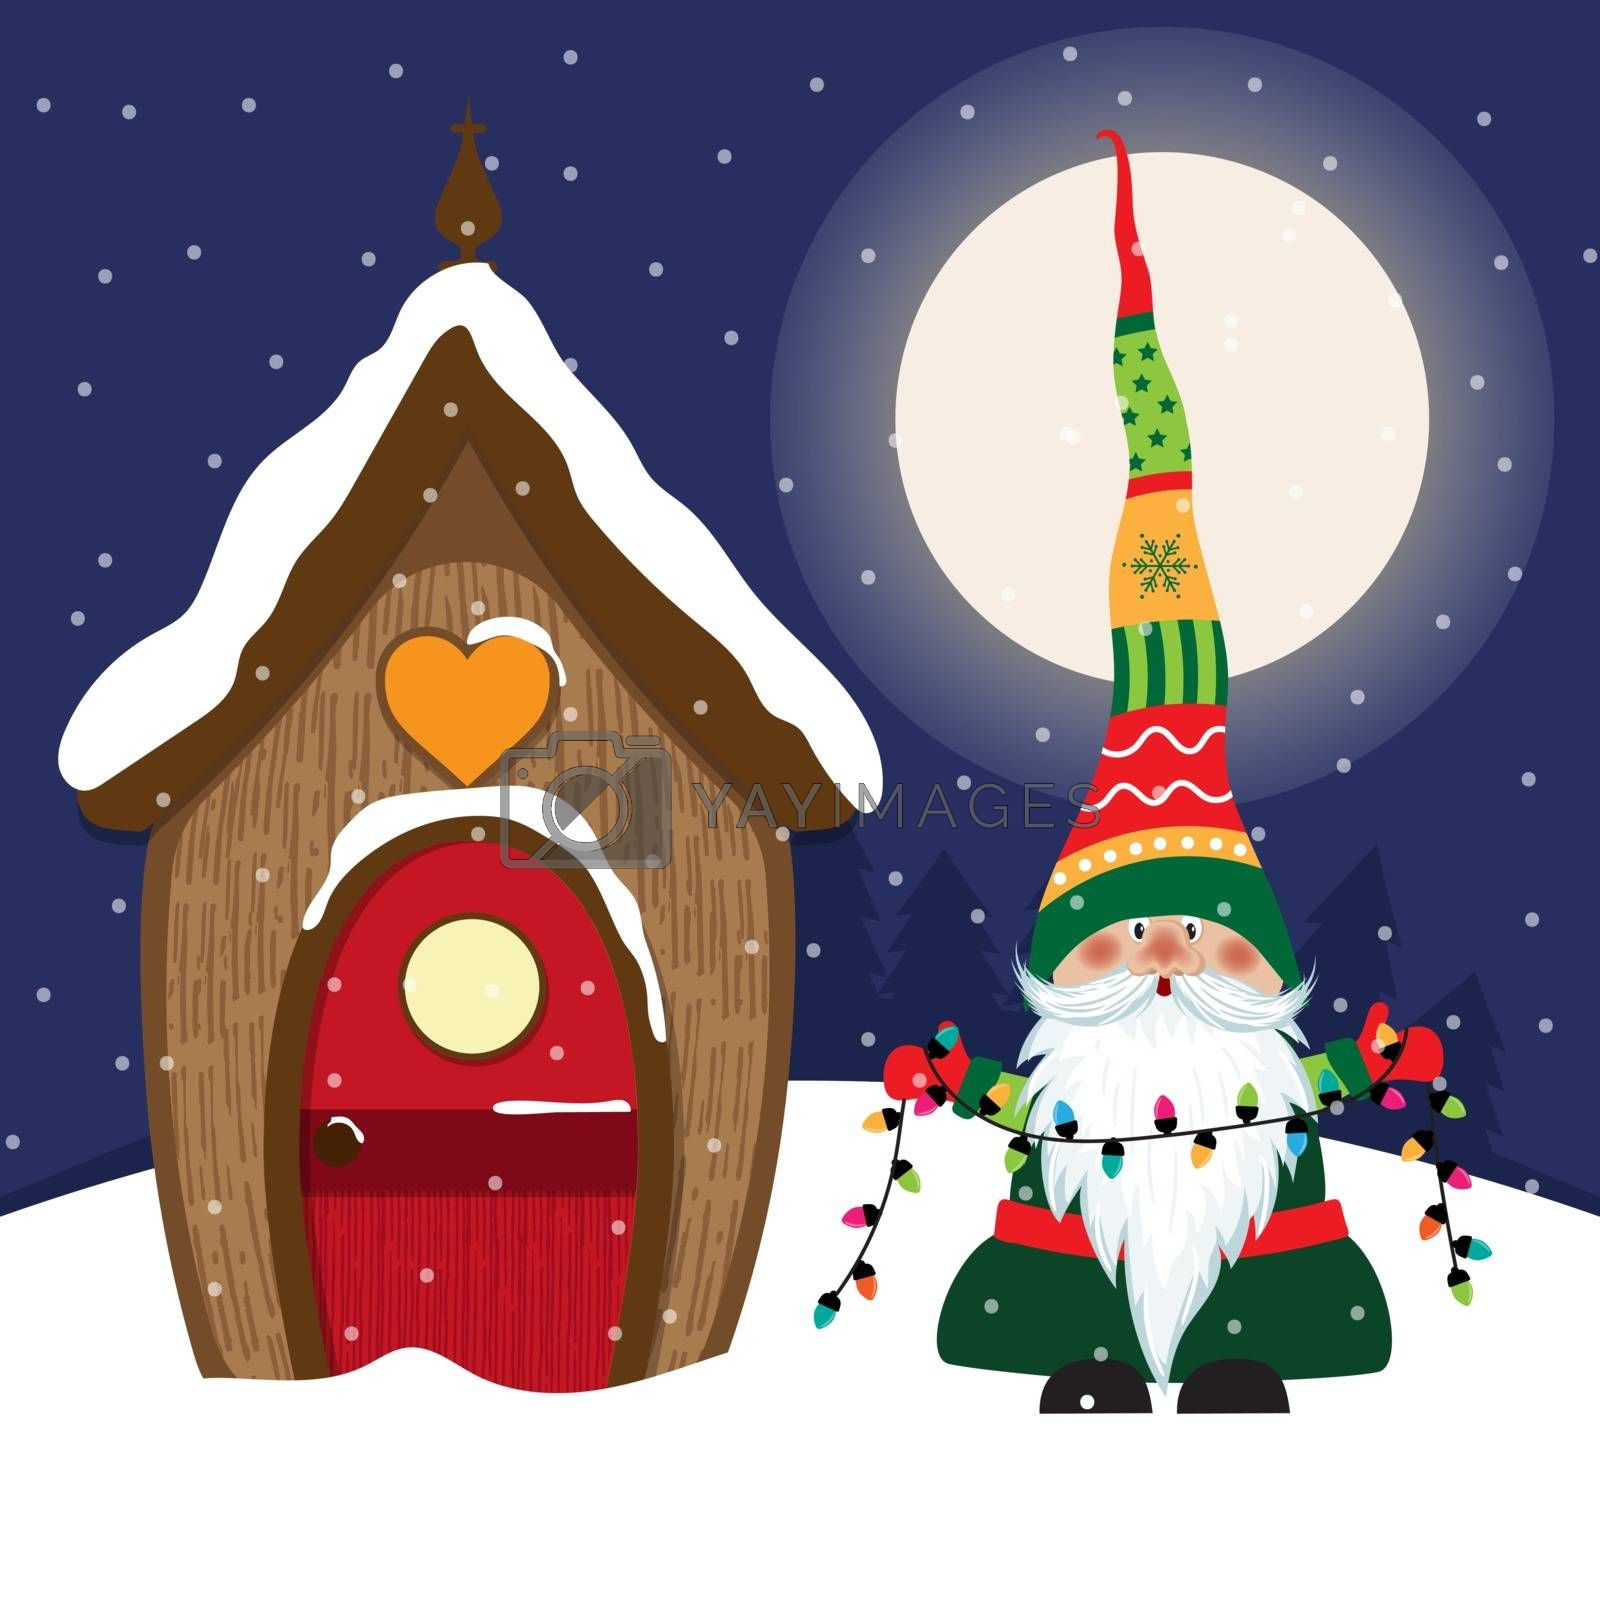 Royalty free image of Beautiful Christmas scene with gnome by balasoiu